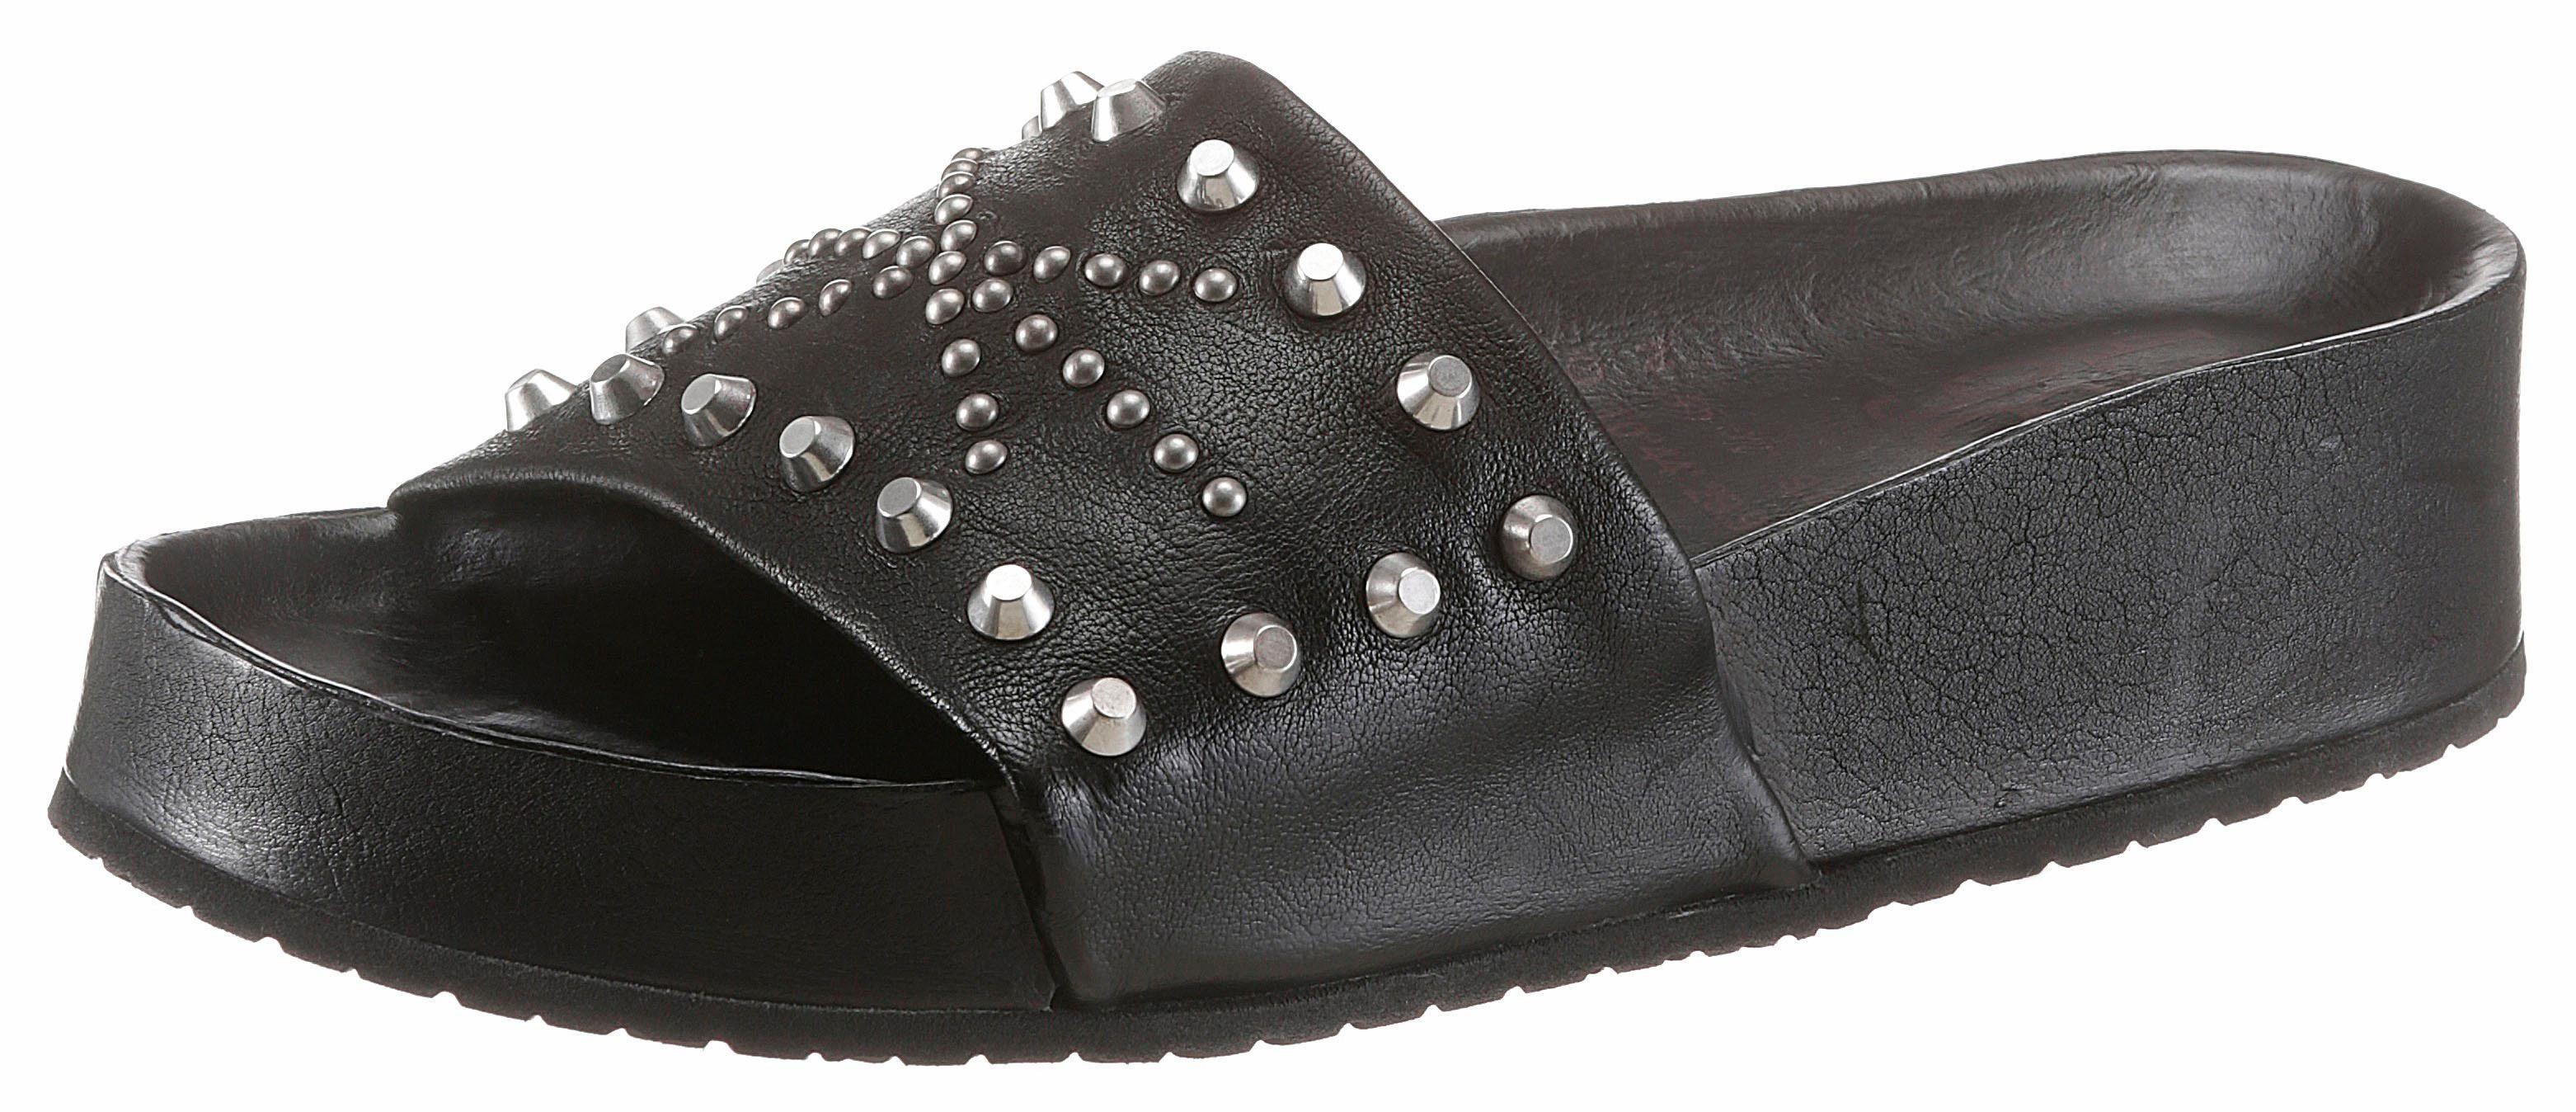 AS98 Pantolette, mit angesagter Plateausohle  schwarz